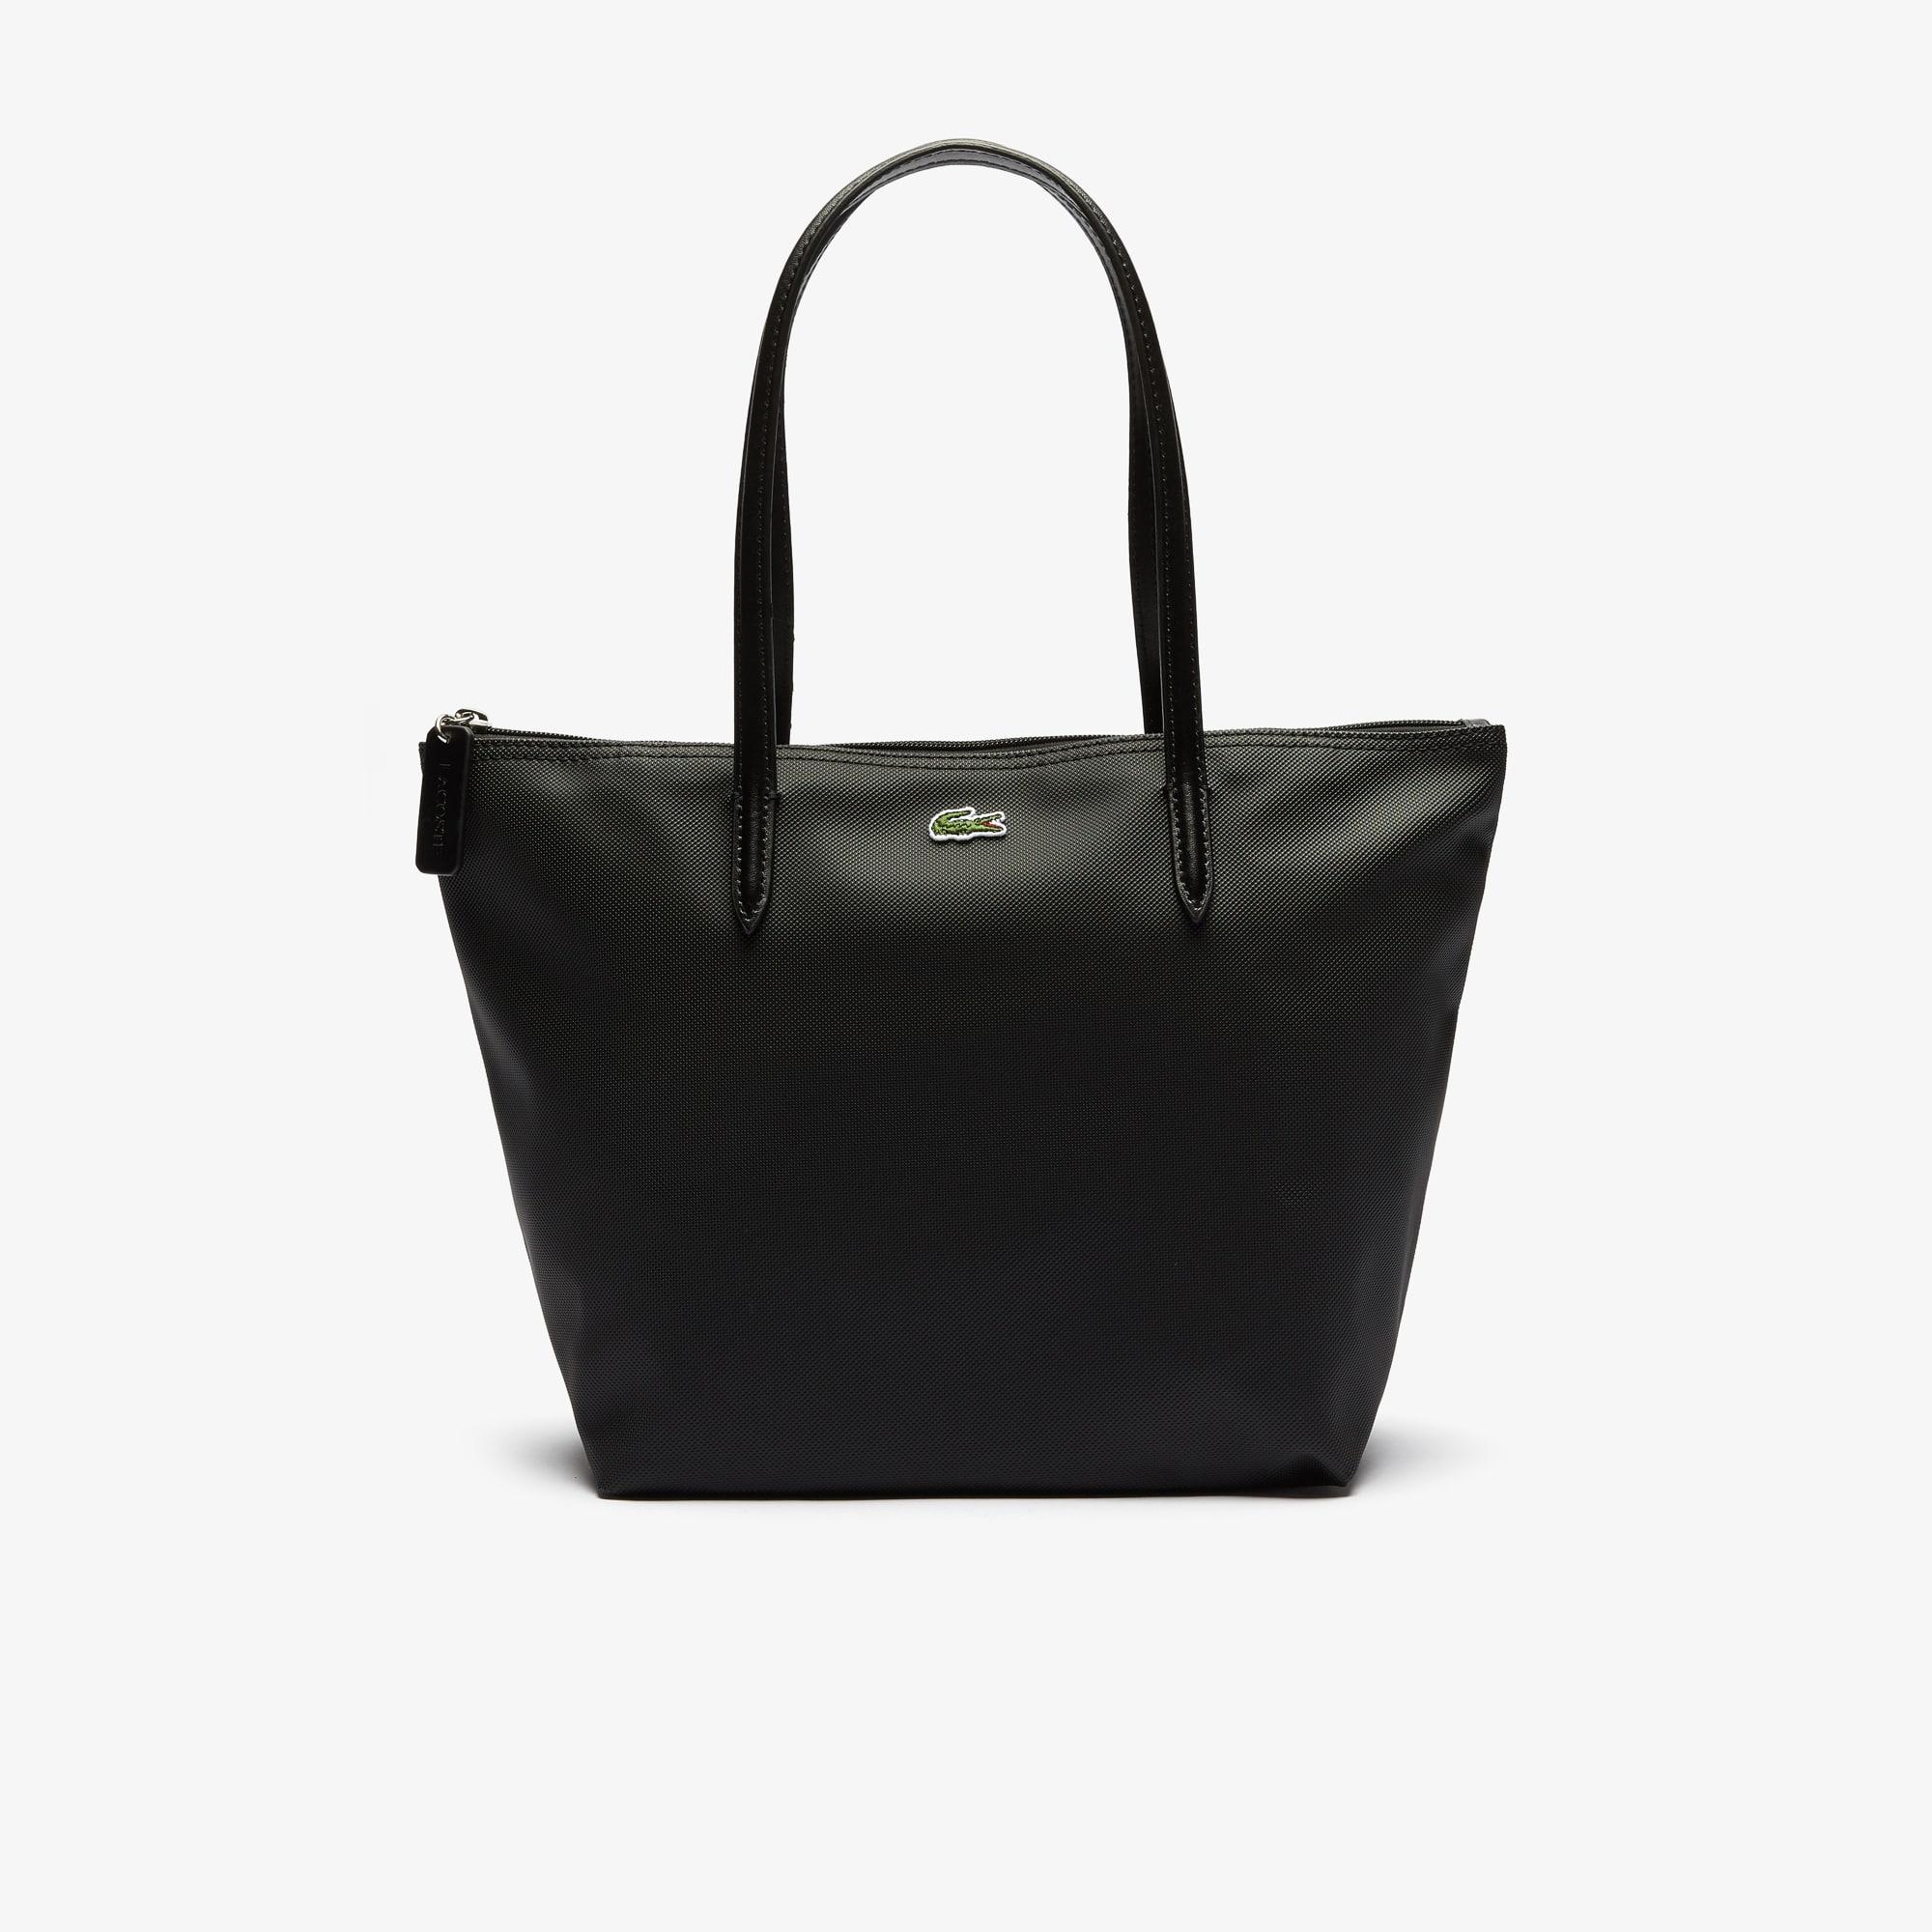 tout neuf f15bf 229fc Sacs à main cuir, sacs cabas | Maroquinerie femme | LACOSTE